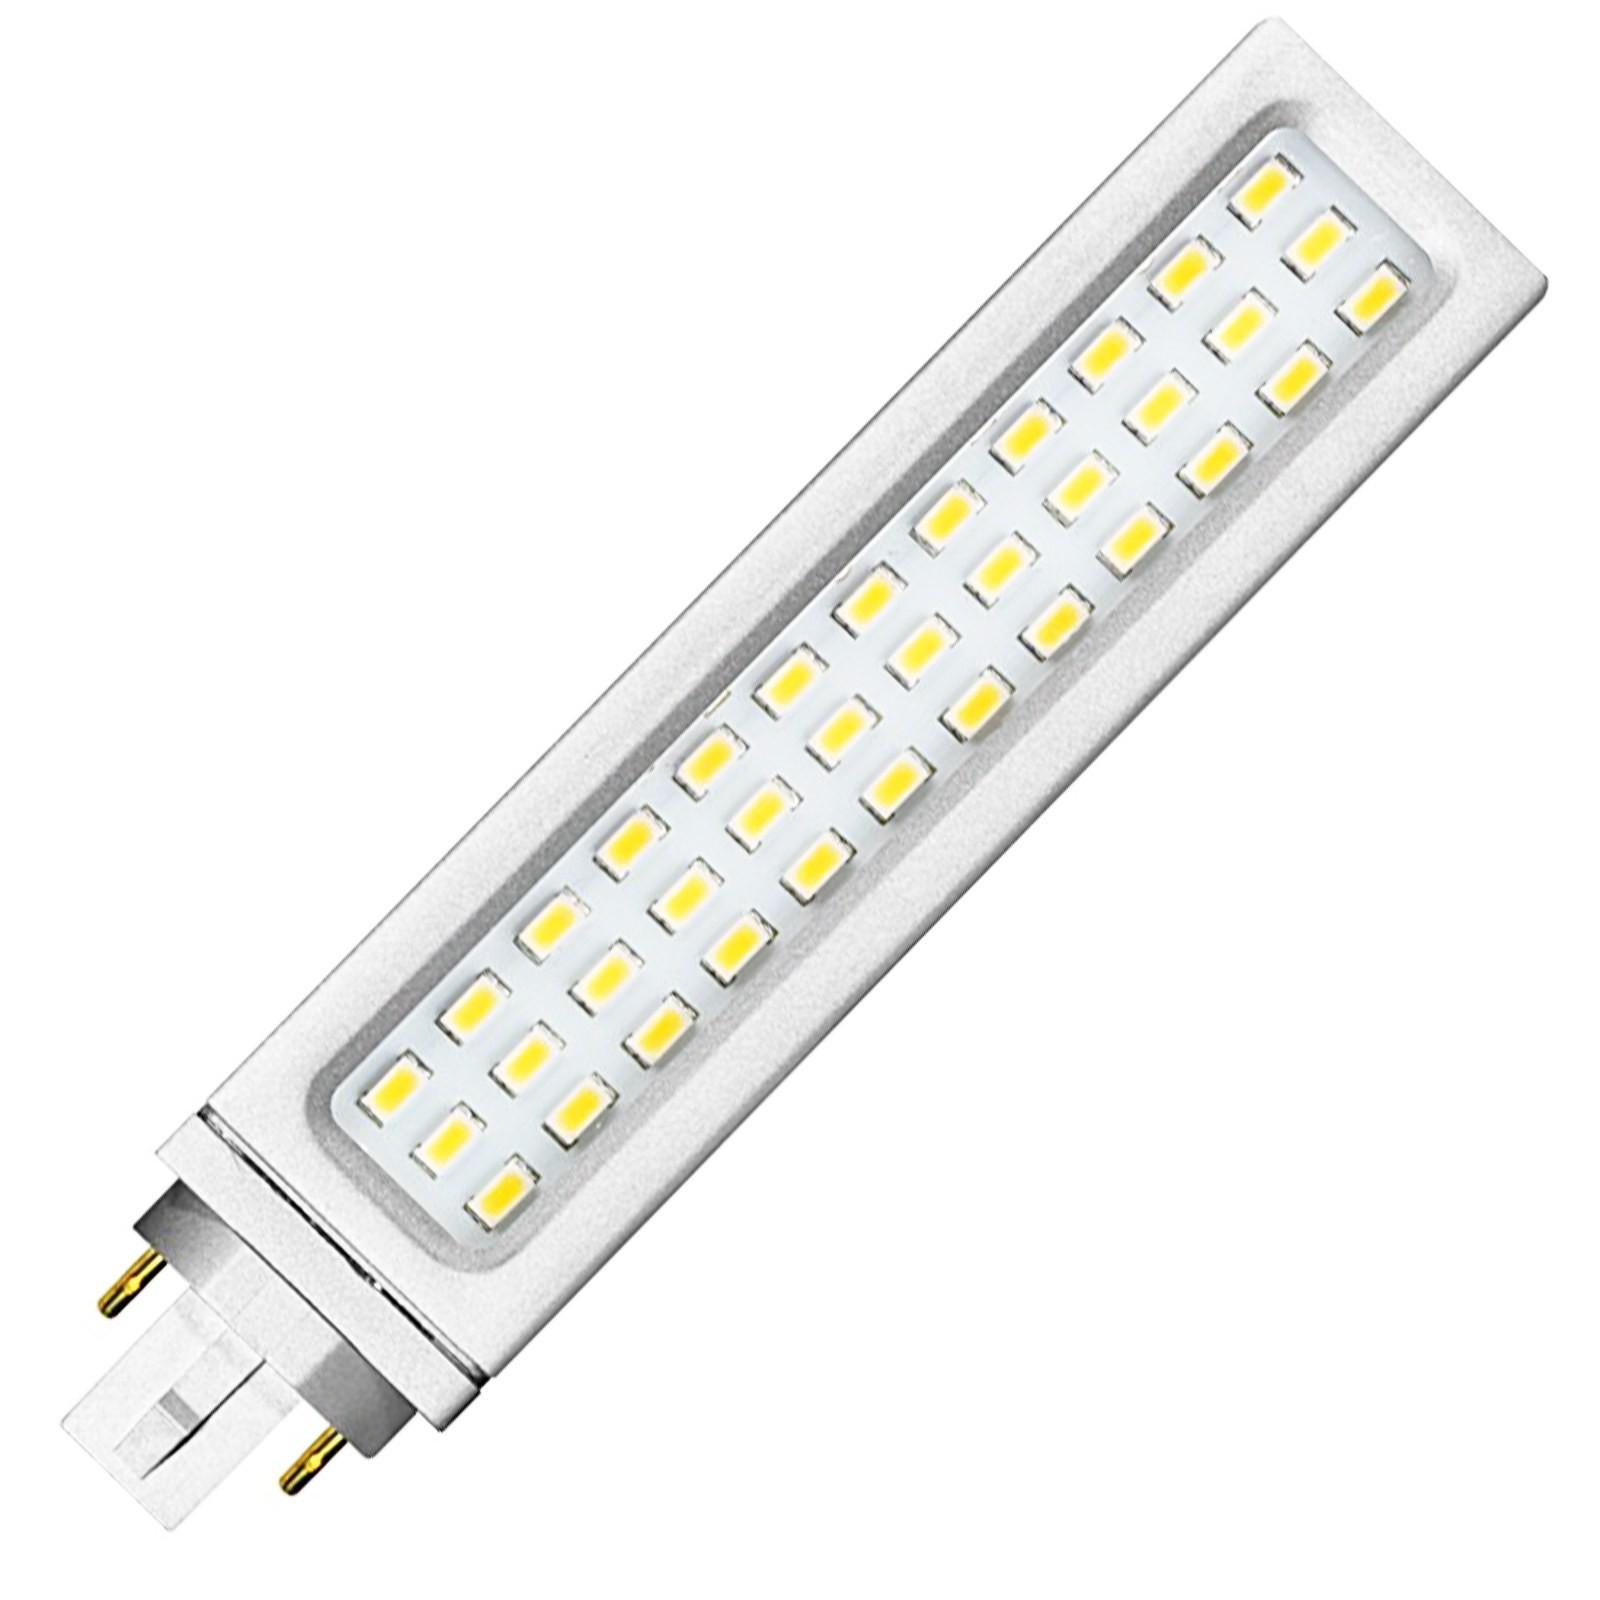 Lampada lampadina led smd 12 watt life plc luce bianca for Lampade lunghe a led